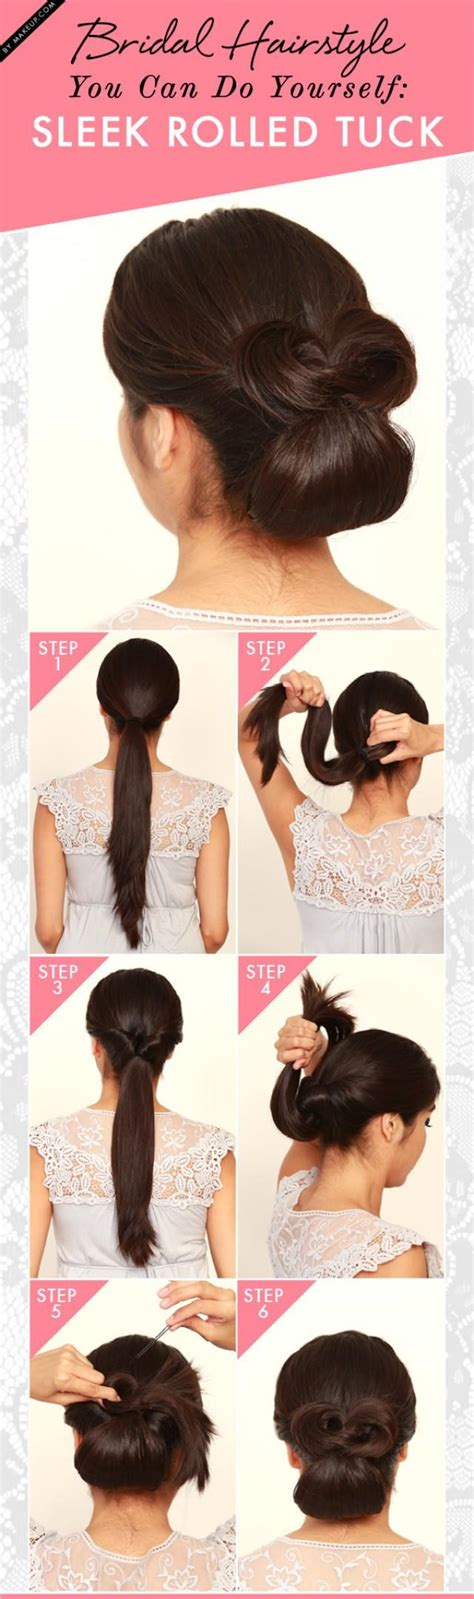 bridal hairstyle      sleek rolled tuck